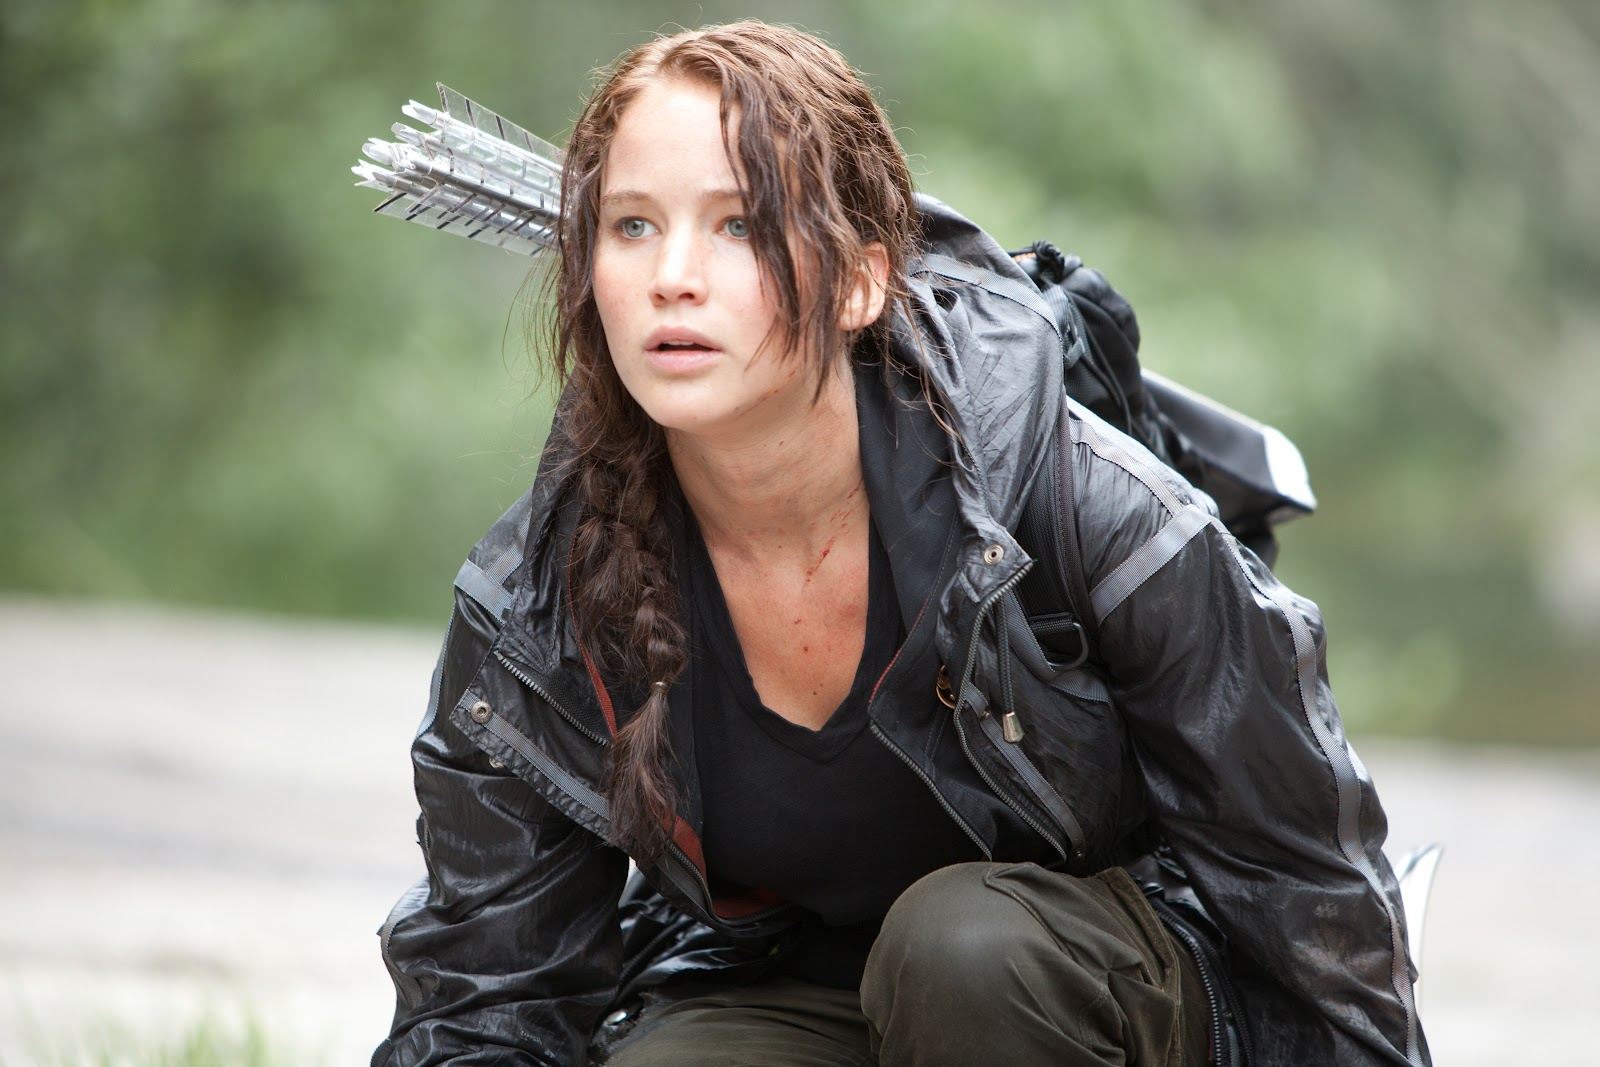 Jennifer Lawrence as Katniss Everdeen in The Hunger Games (2012)